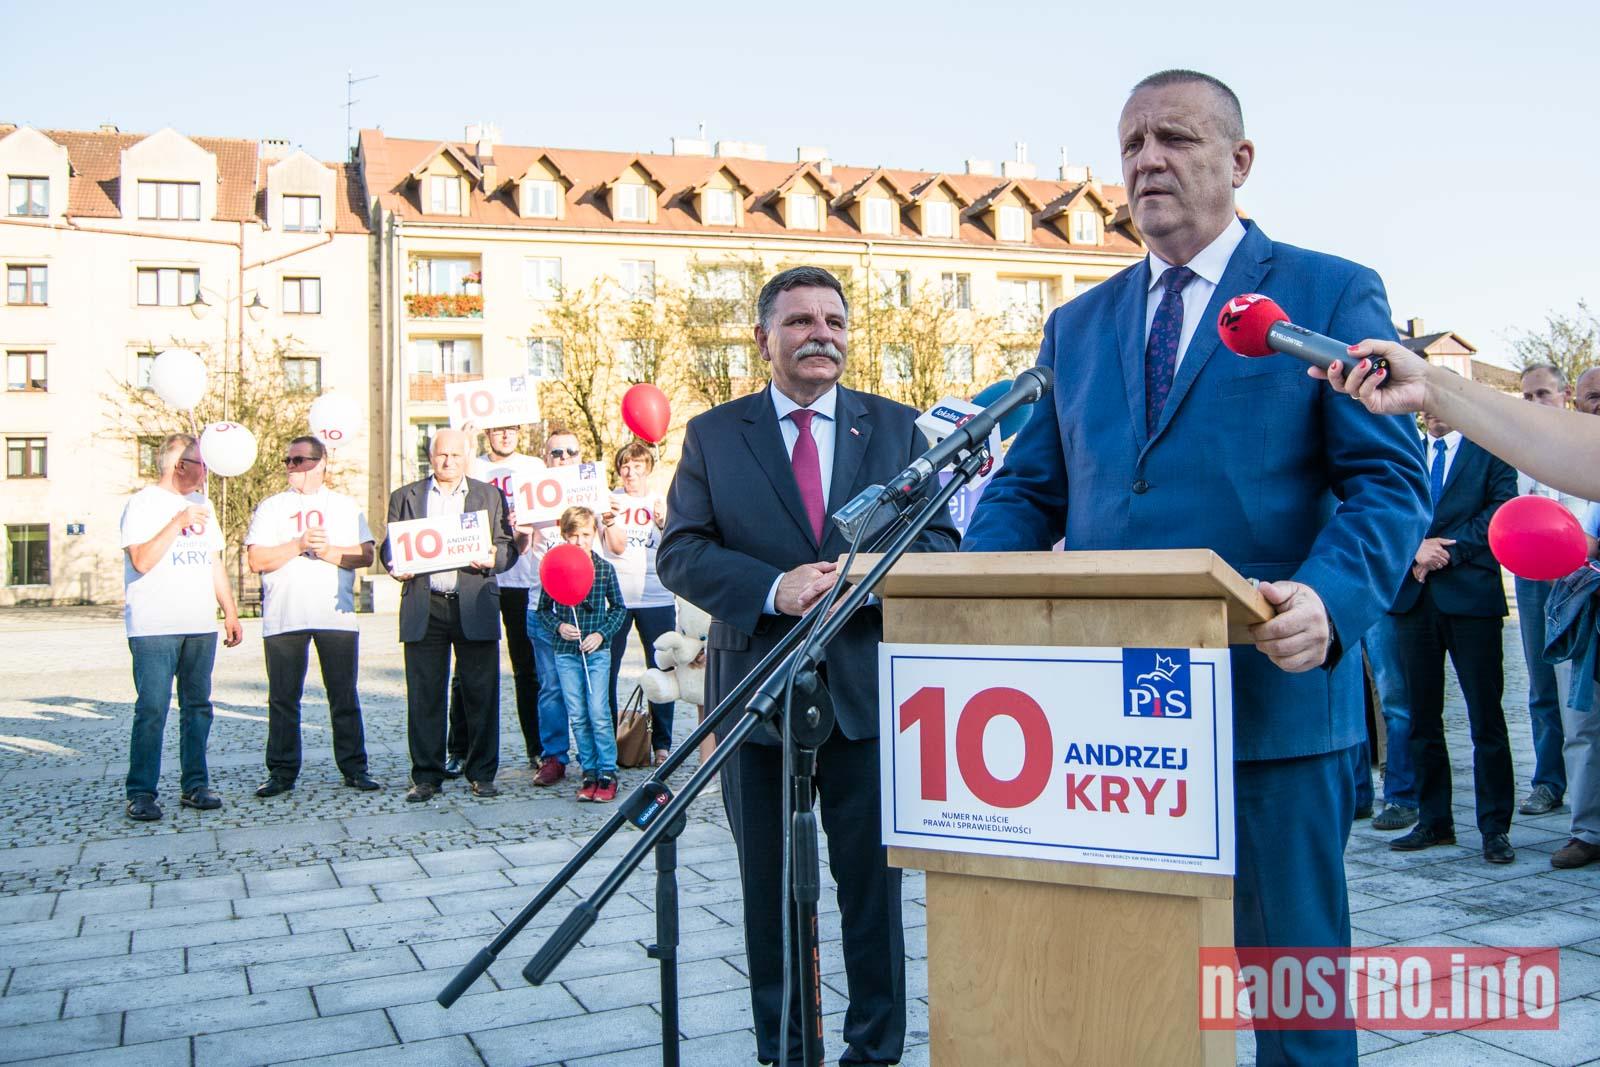 NaOSTRO Andrzej Kryj kampania-19